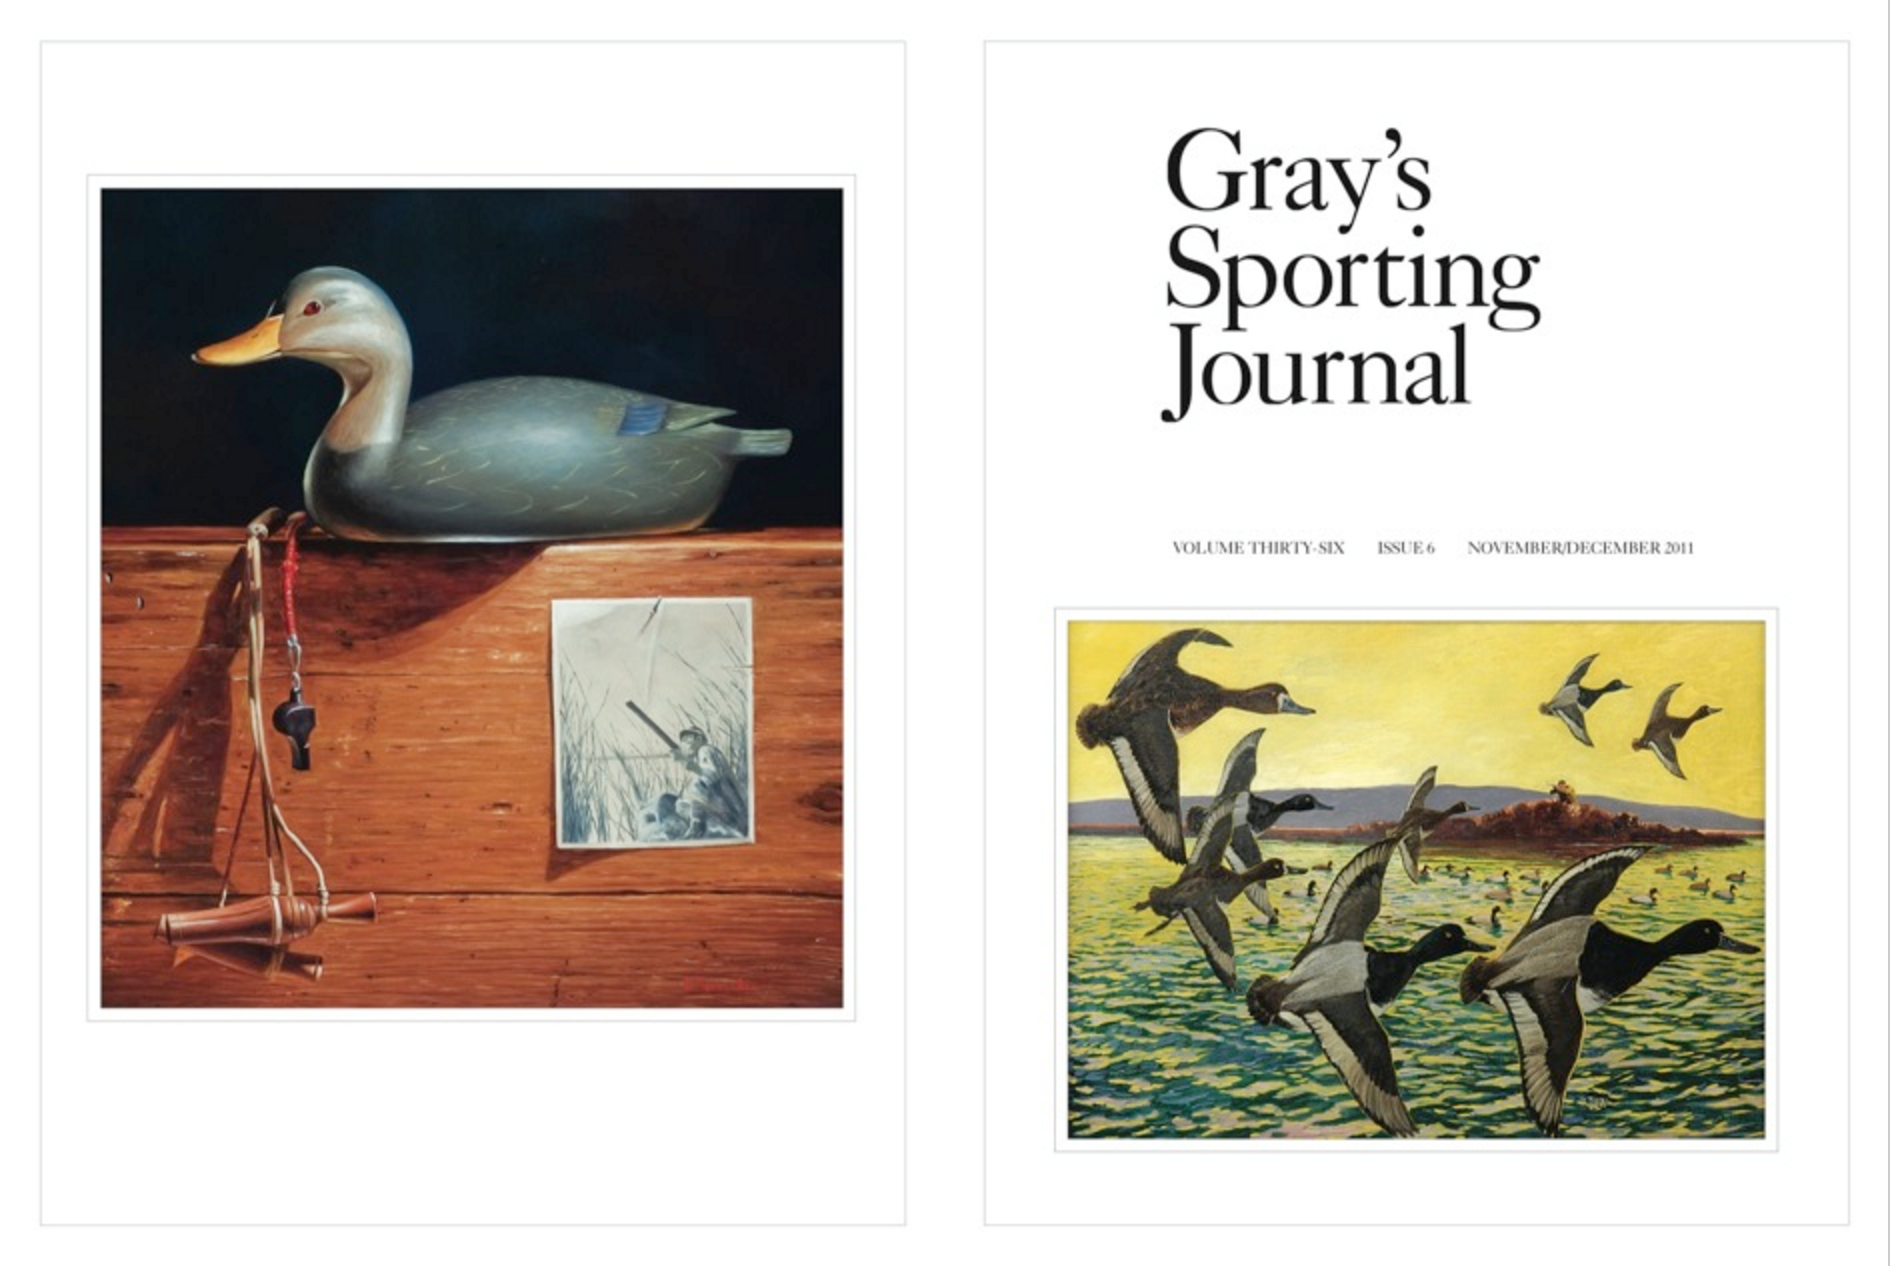 GRAY'S SPORTING JOURNAL Sept/October 2010 Issue 5 Volume 35